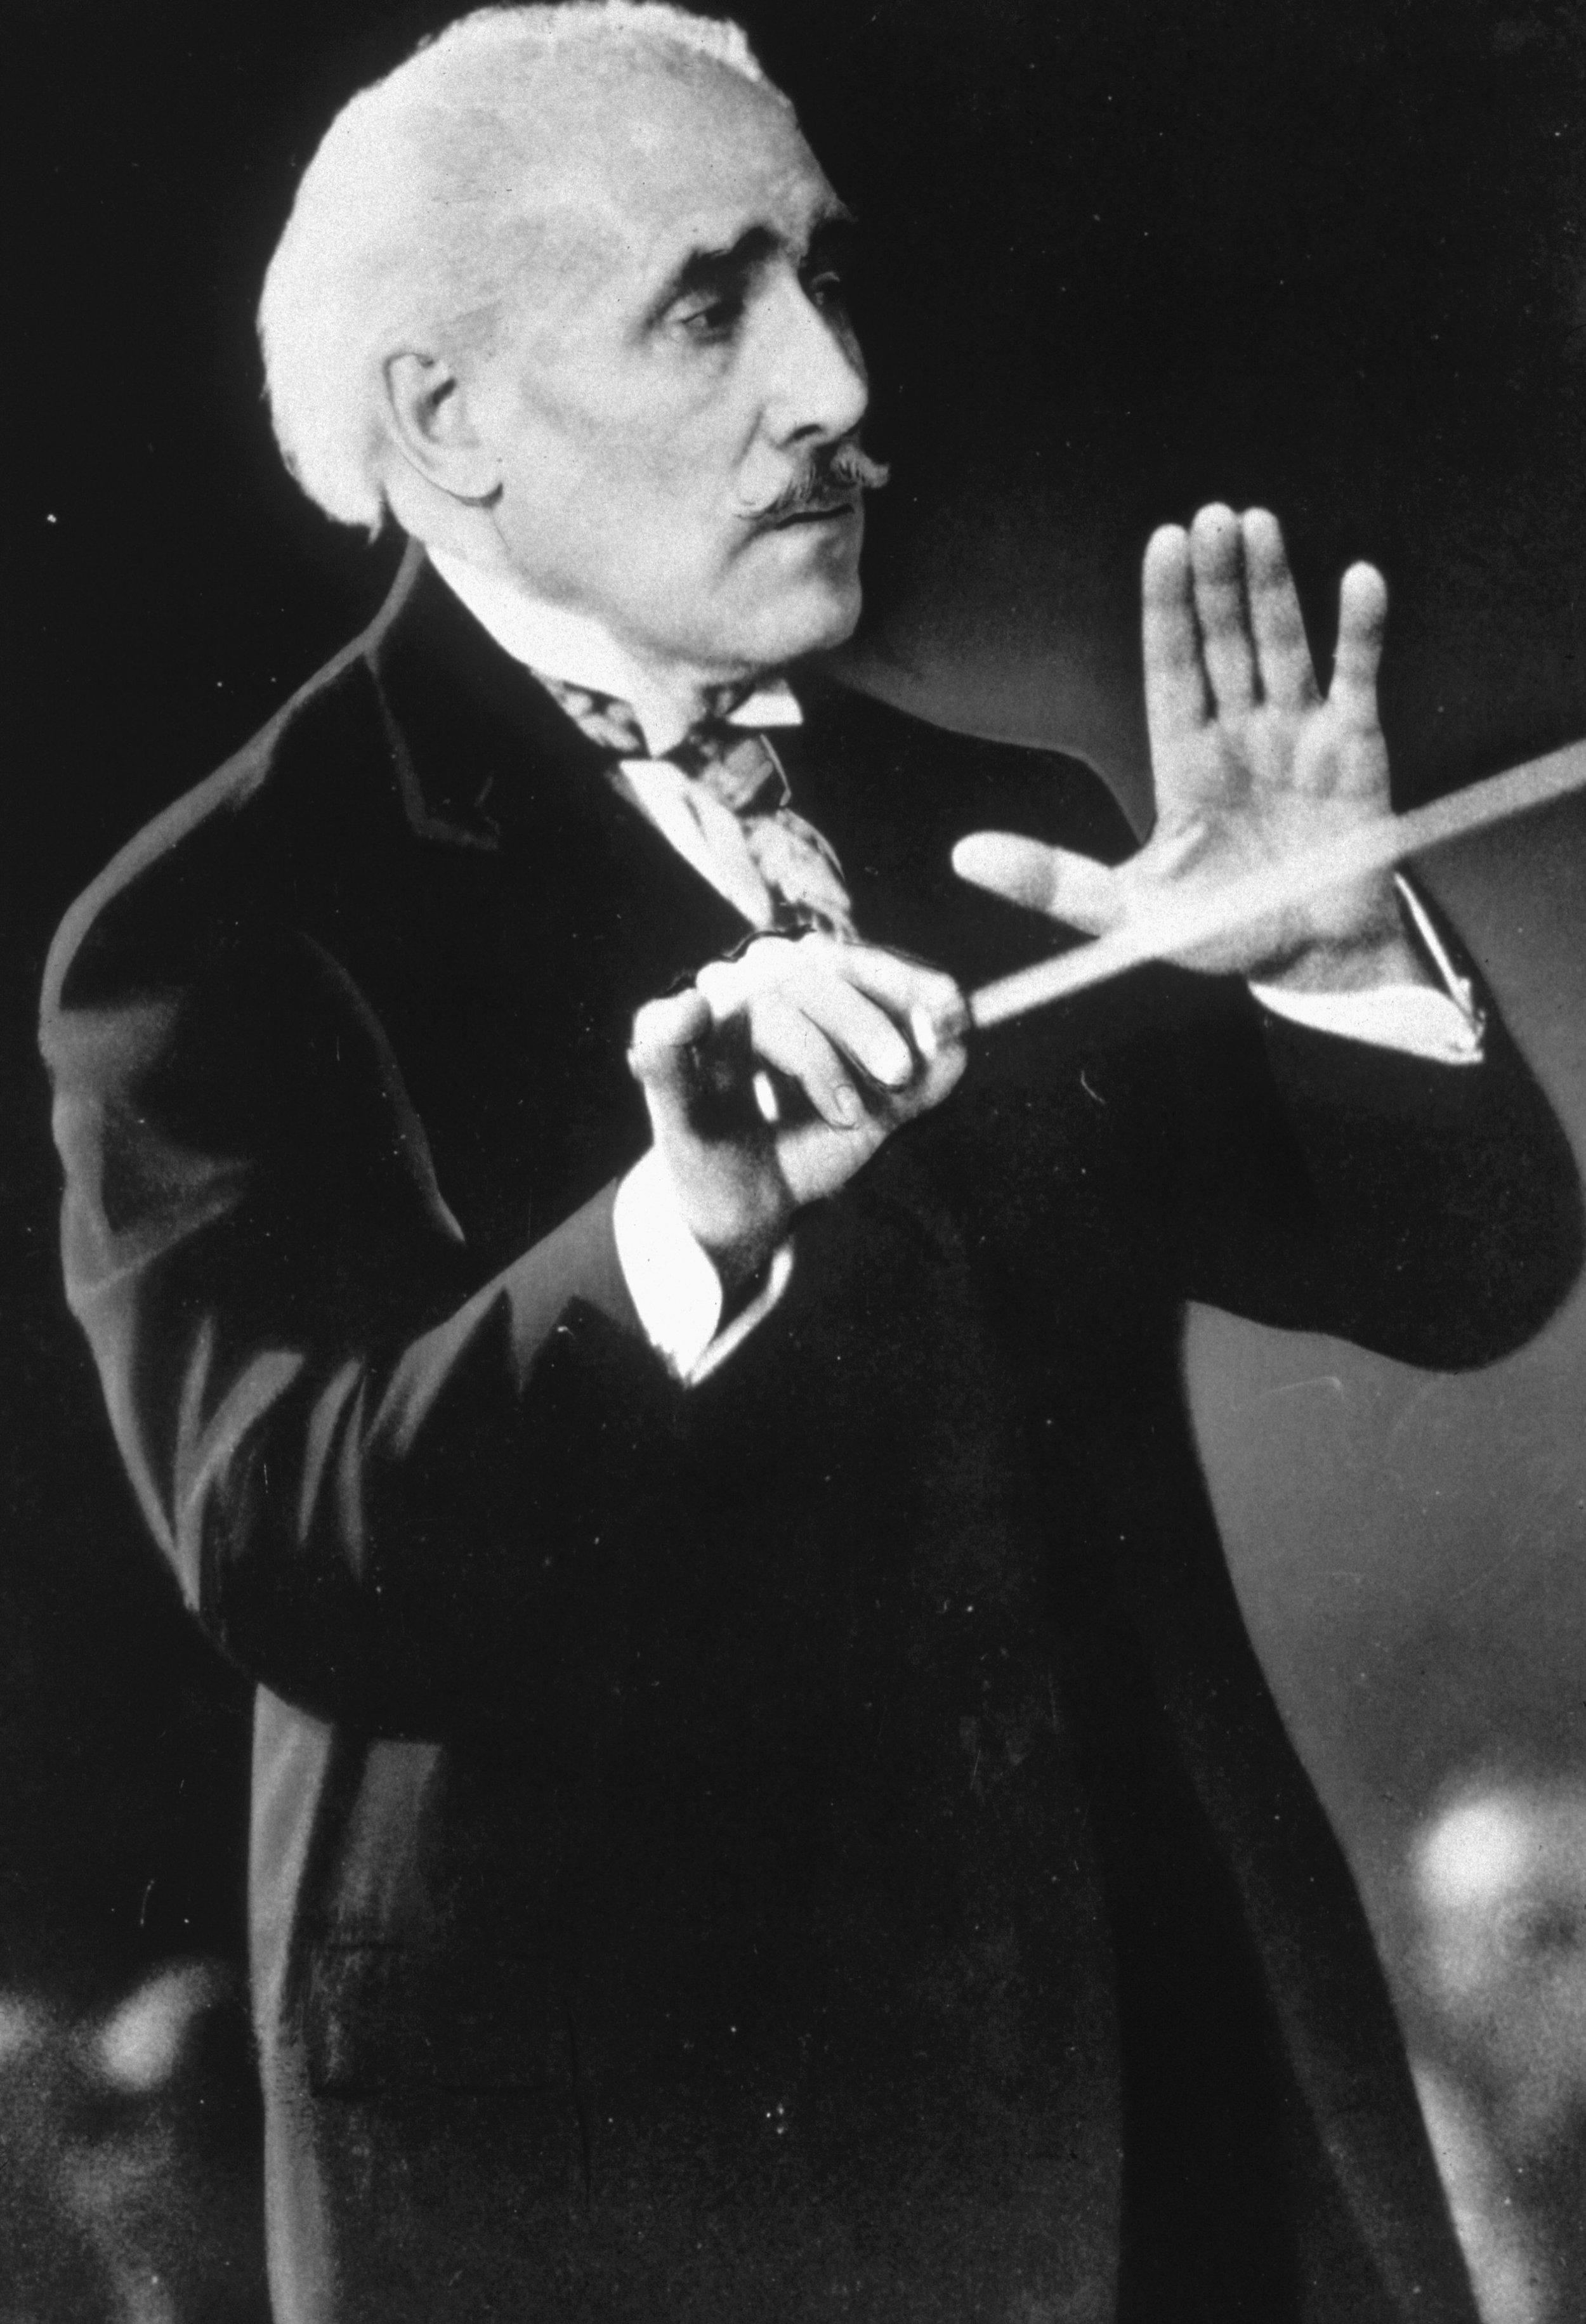 Arturo Toscanini (1920-1945)